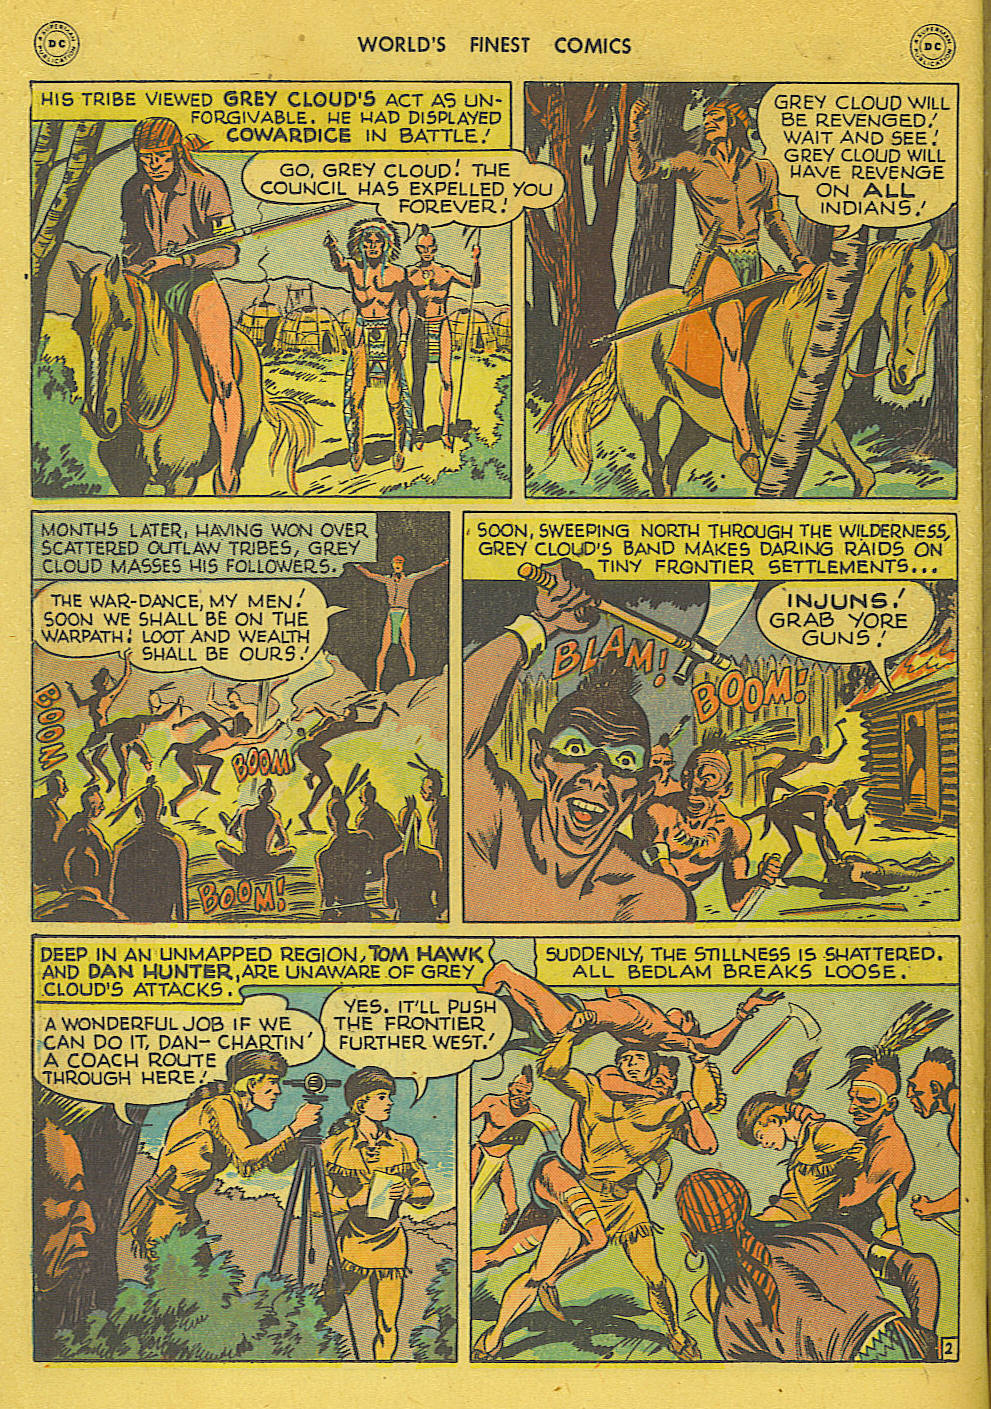 Read online World's Finest Comics comic -  Issue #34 - 18